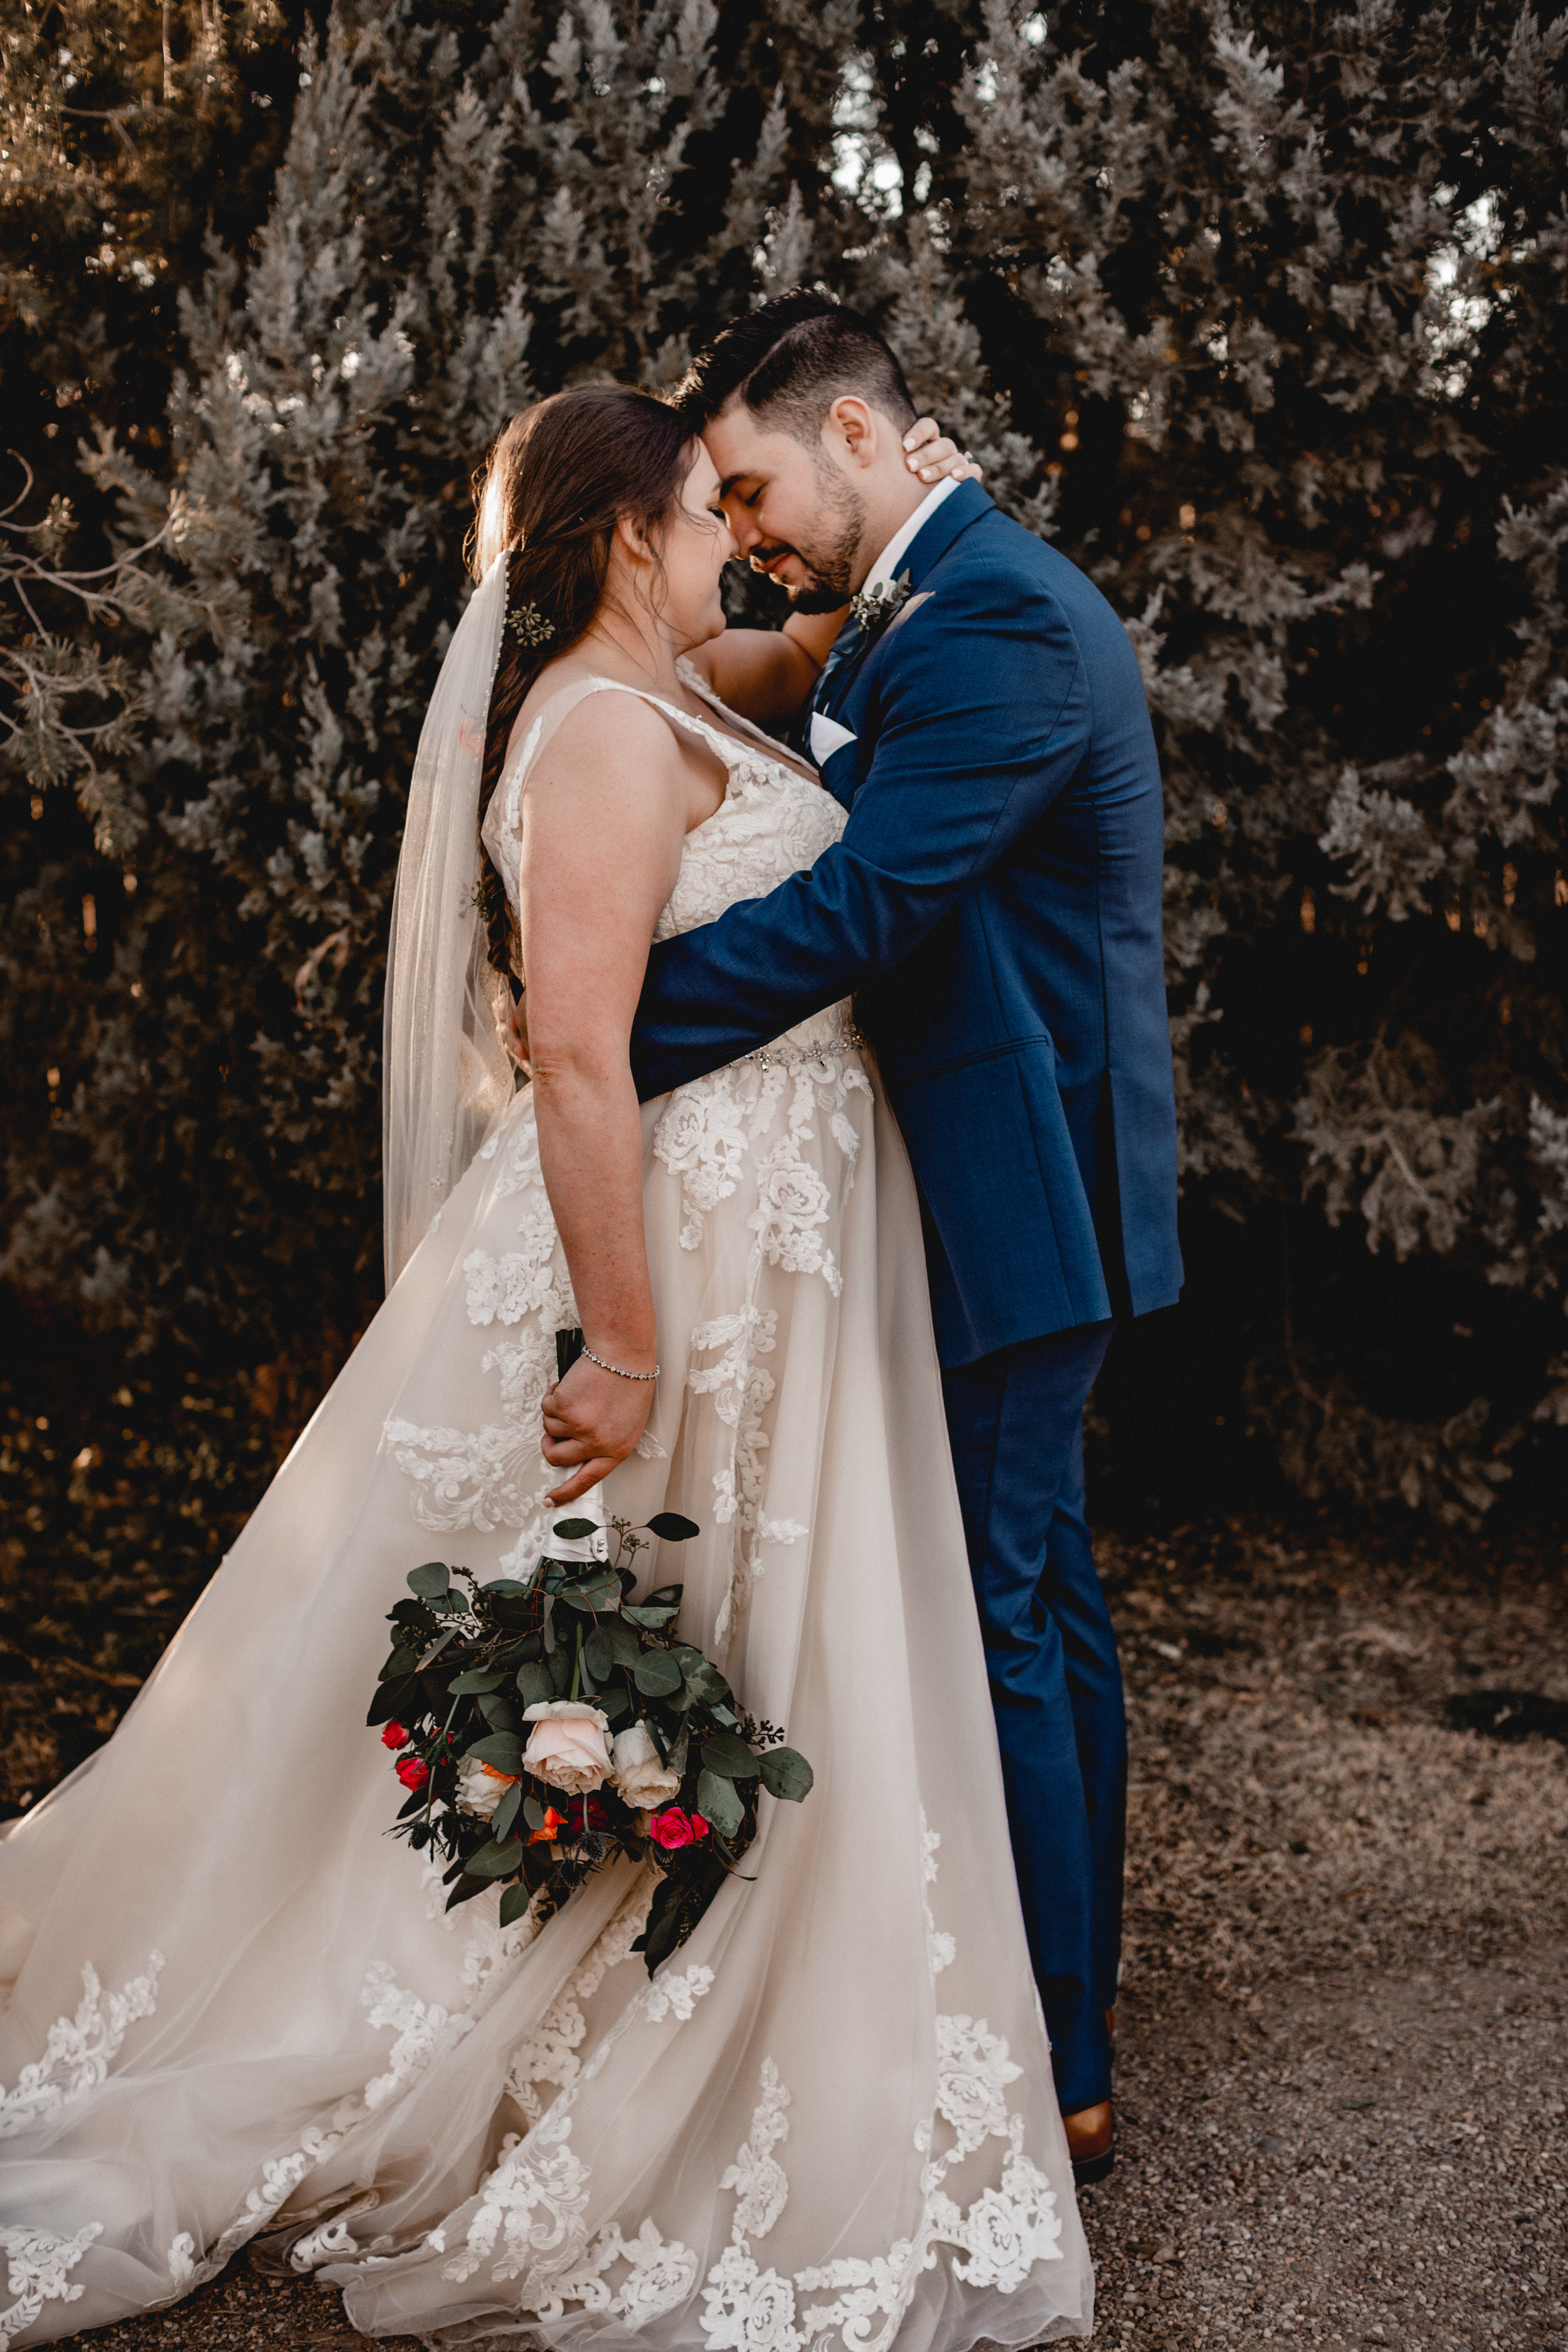 Newlyweds-4.jpg